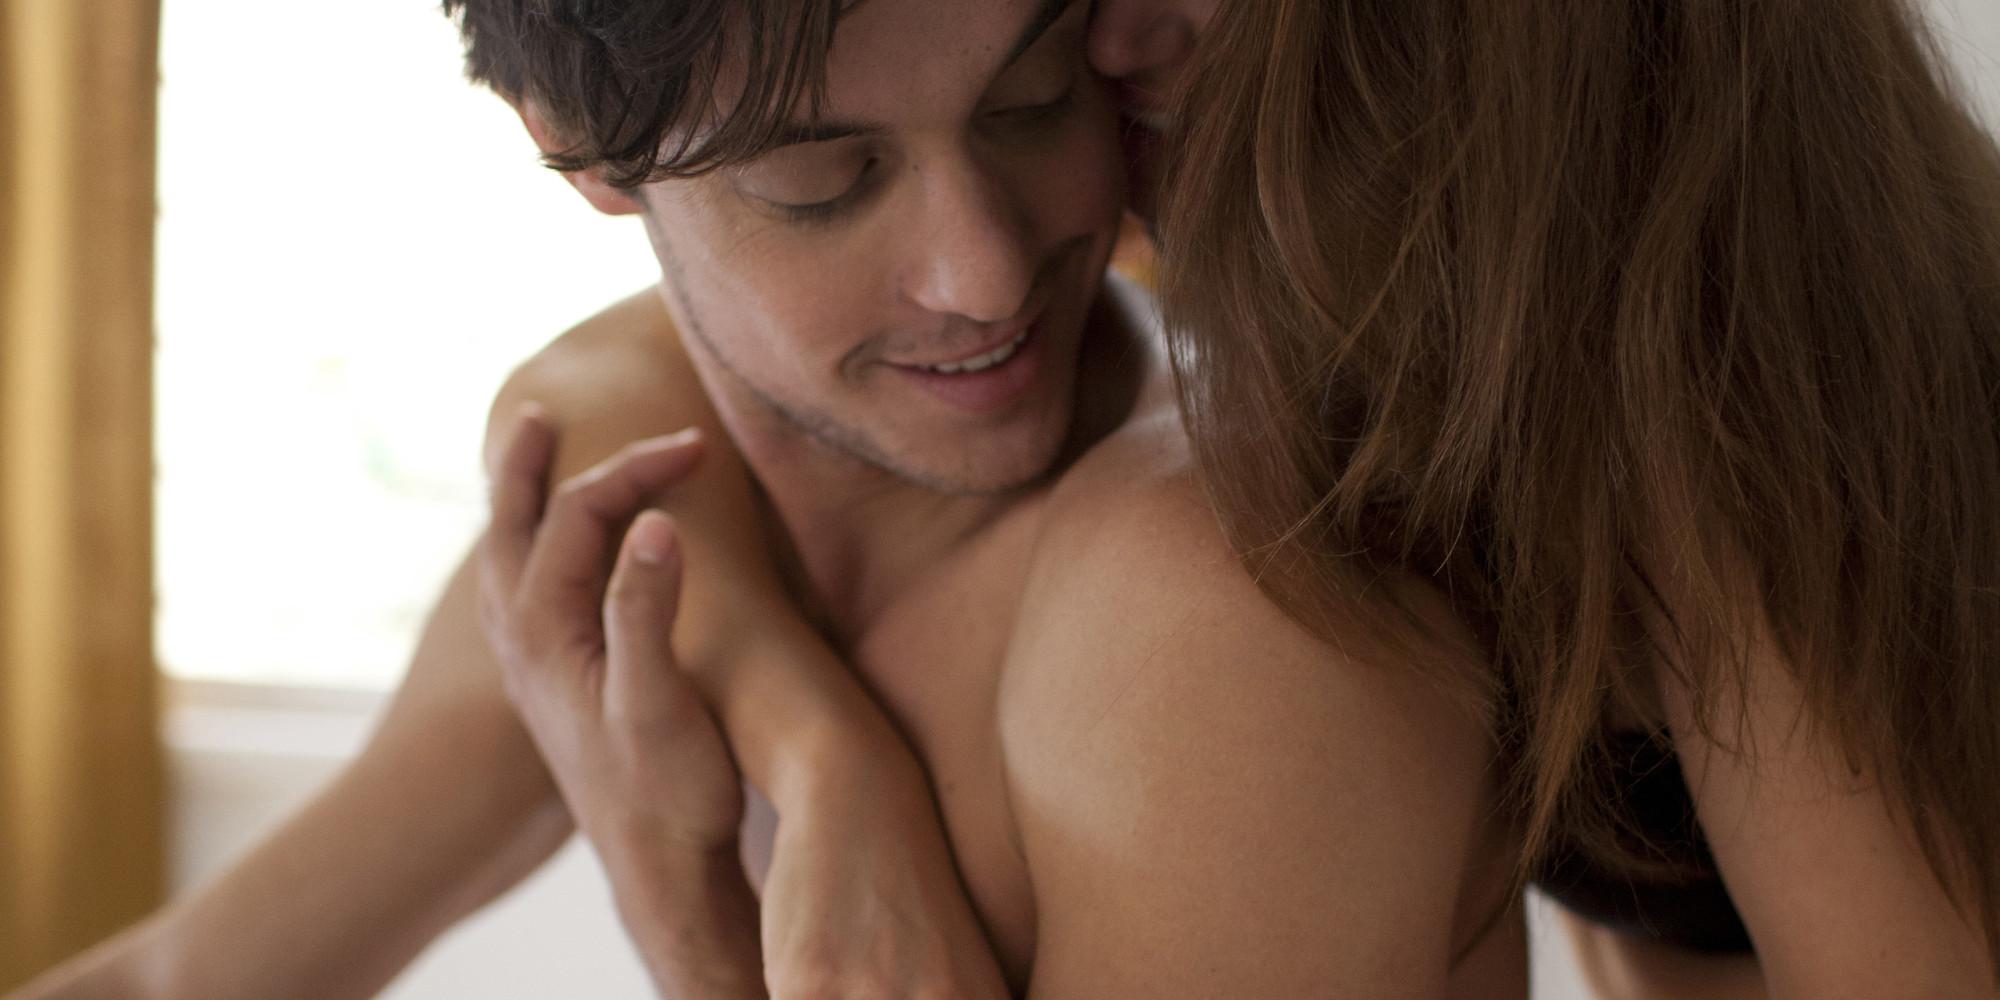 Sexual Arabic Videos 52